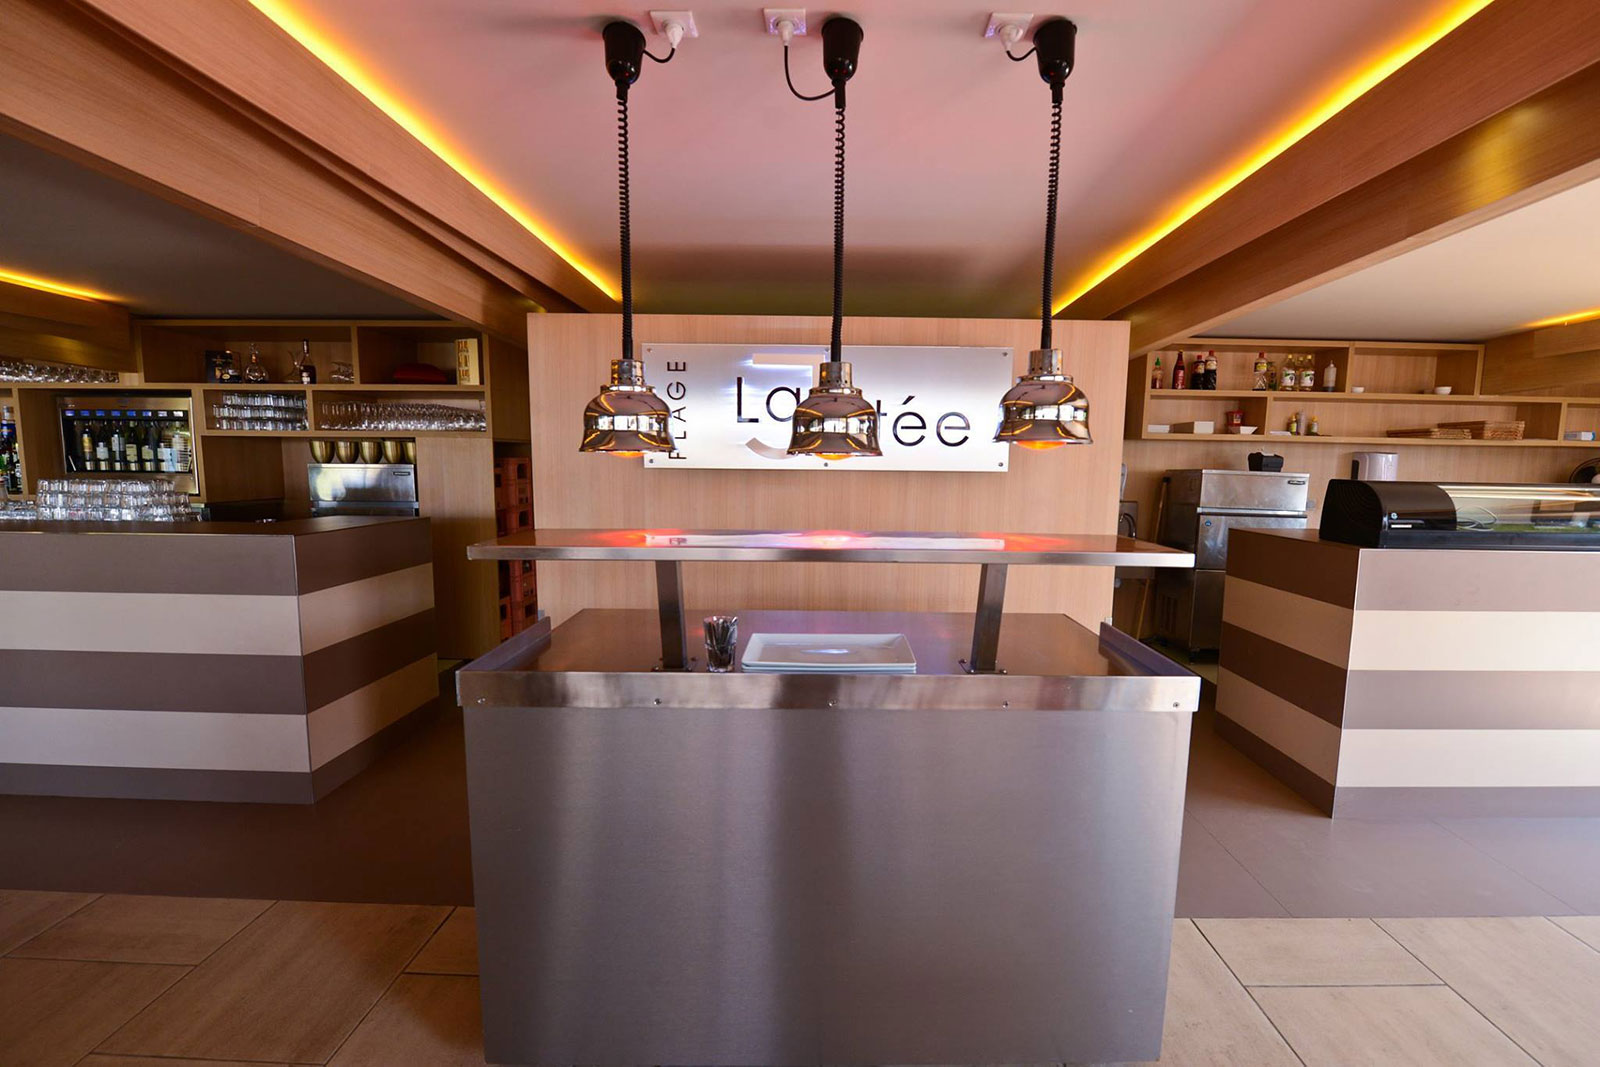 plage-restaurant-antibes-juan-les-pins-7